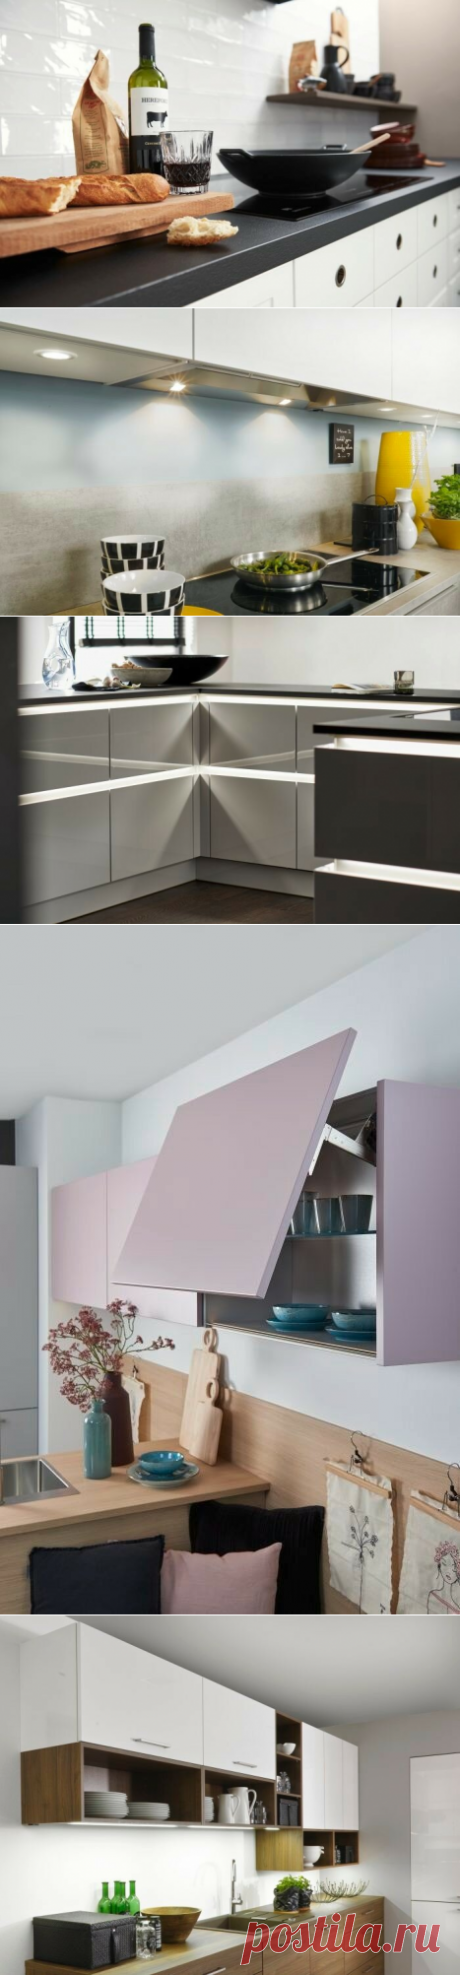 Чем мыть глянцевые фасады на кухне. Секреты ✨чистоты. | Nolte Küchen | Яндекс Дзен